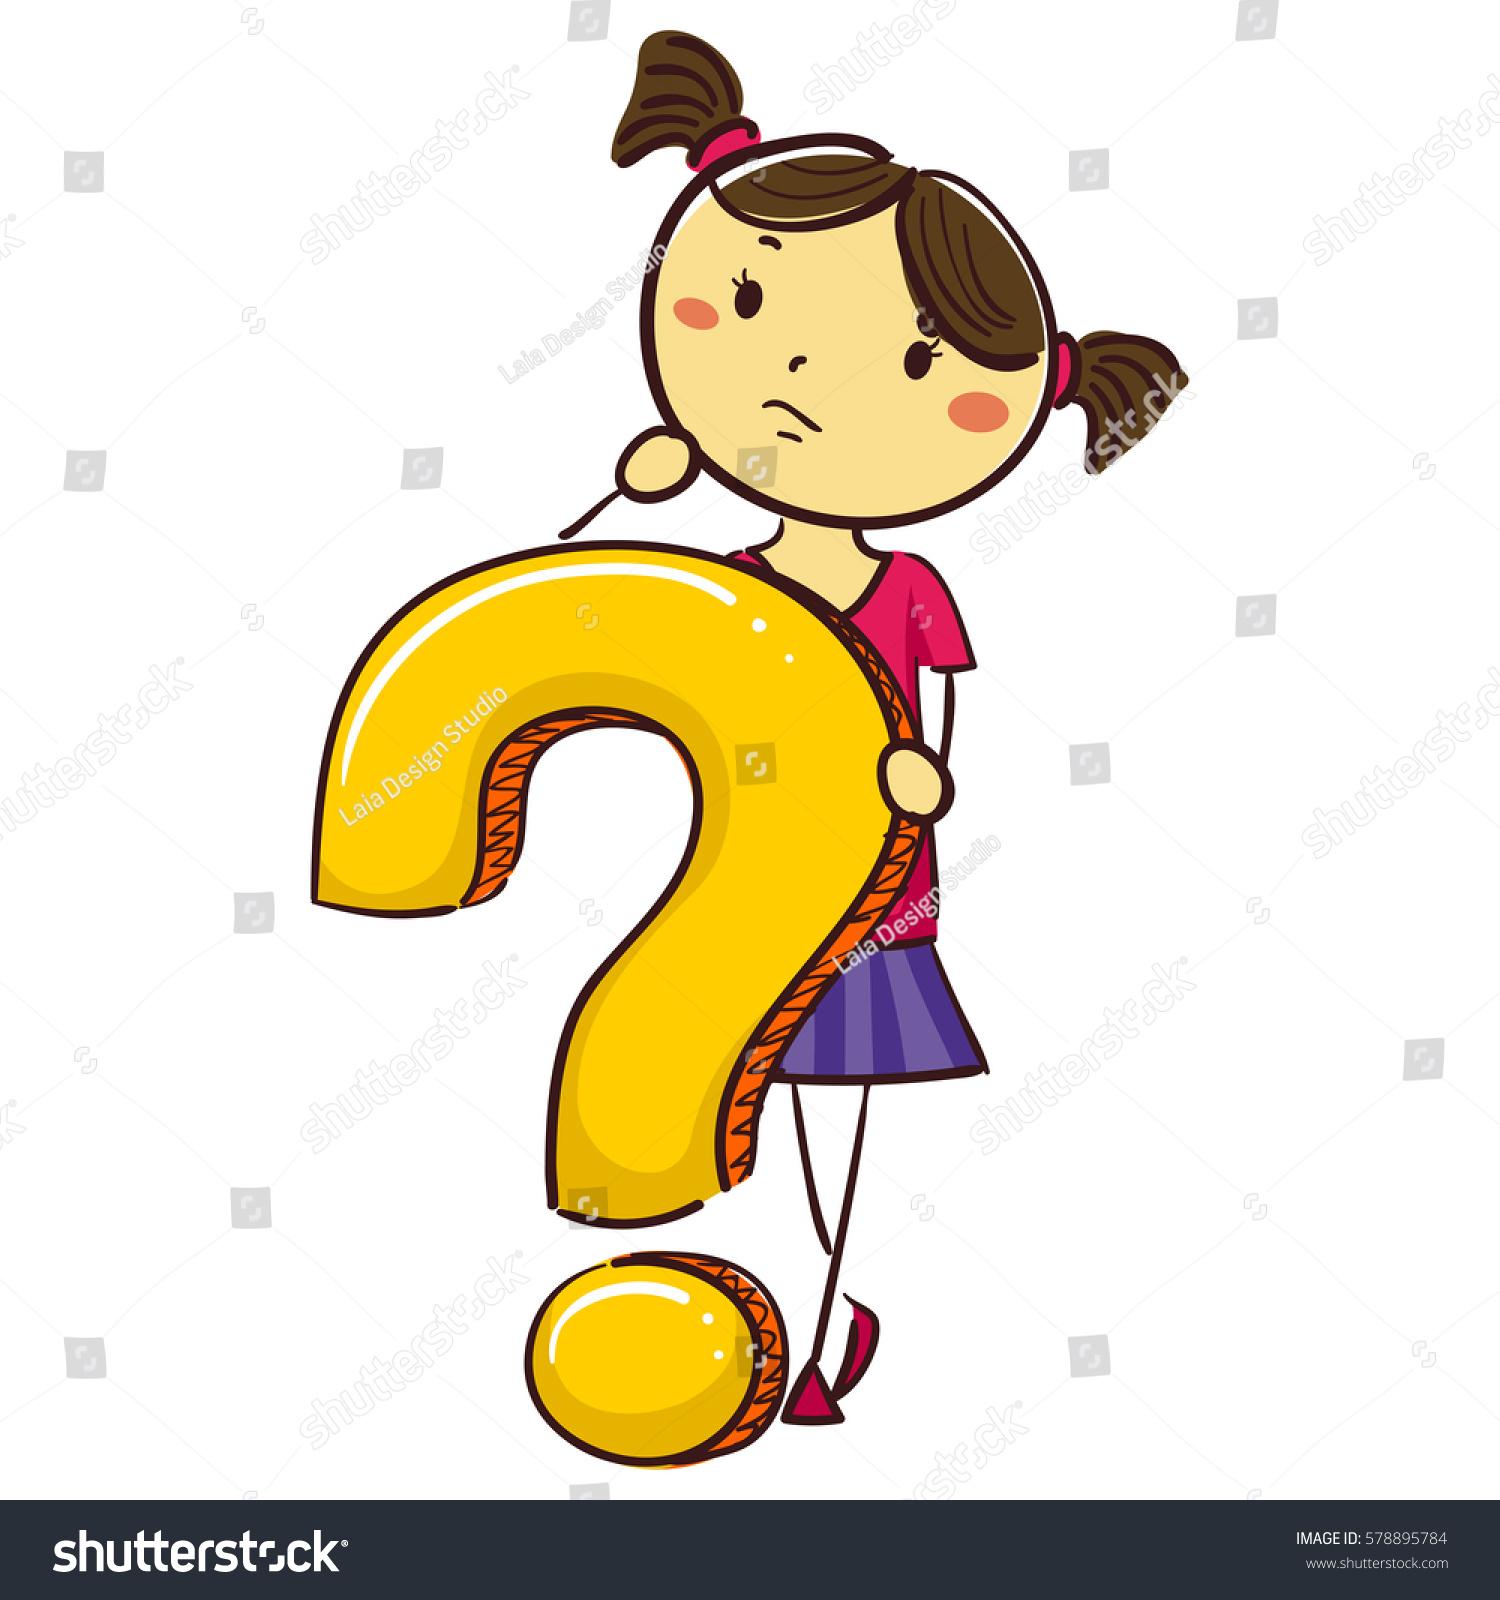 vector illustration stick kid girl question 578895784 shutterstock